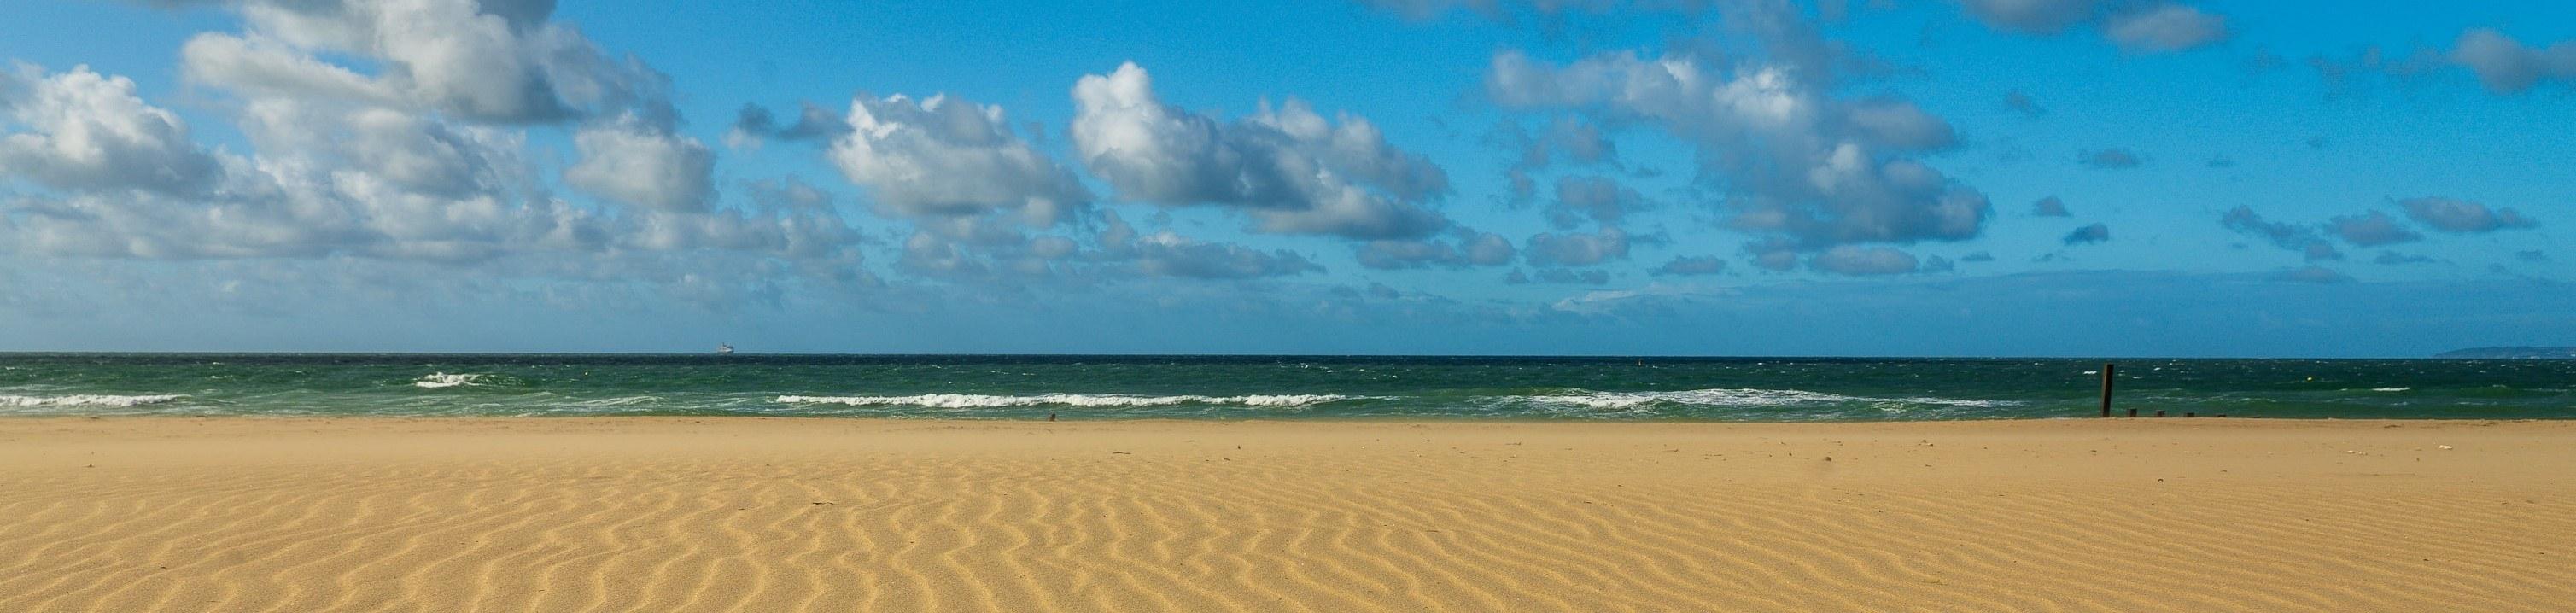 Beach scene image